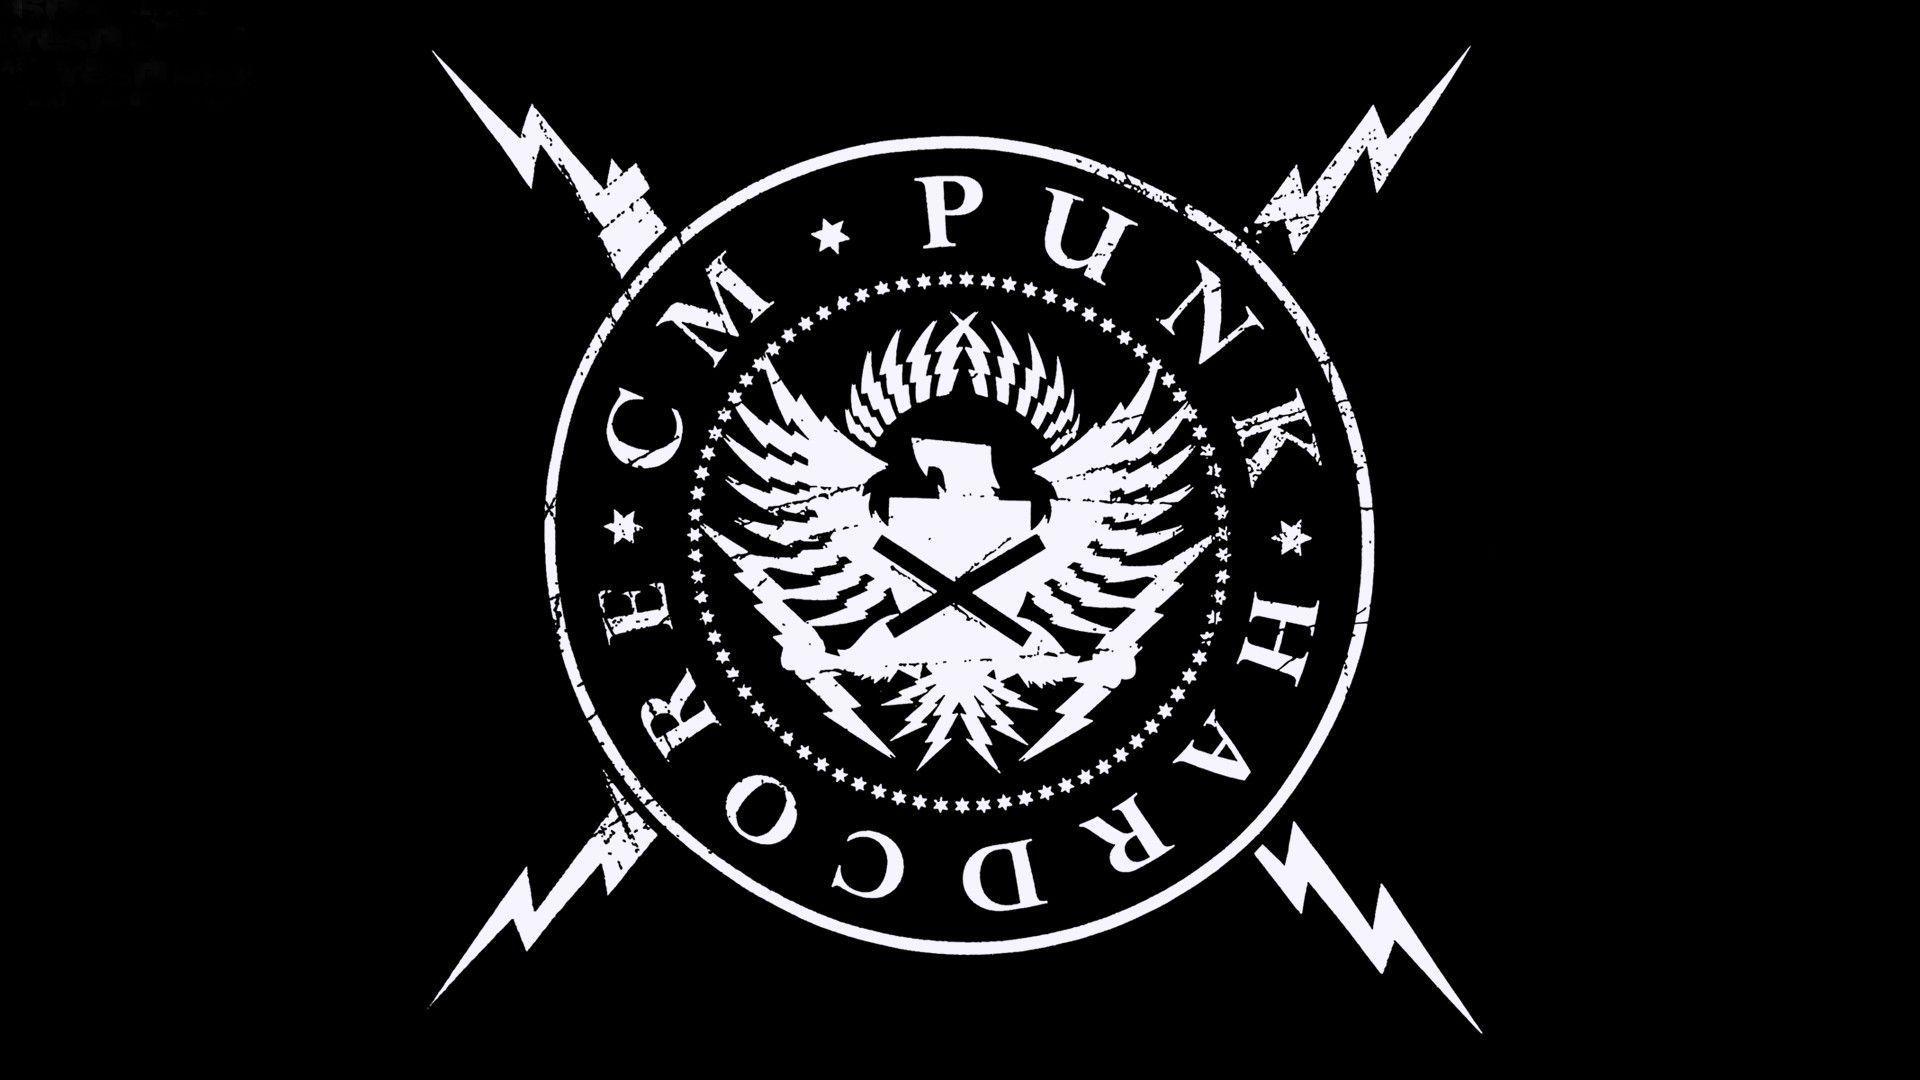 CM Punk Best Symbolic Wallpaper   HD Wallpapers DownloadHD 1920x1080